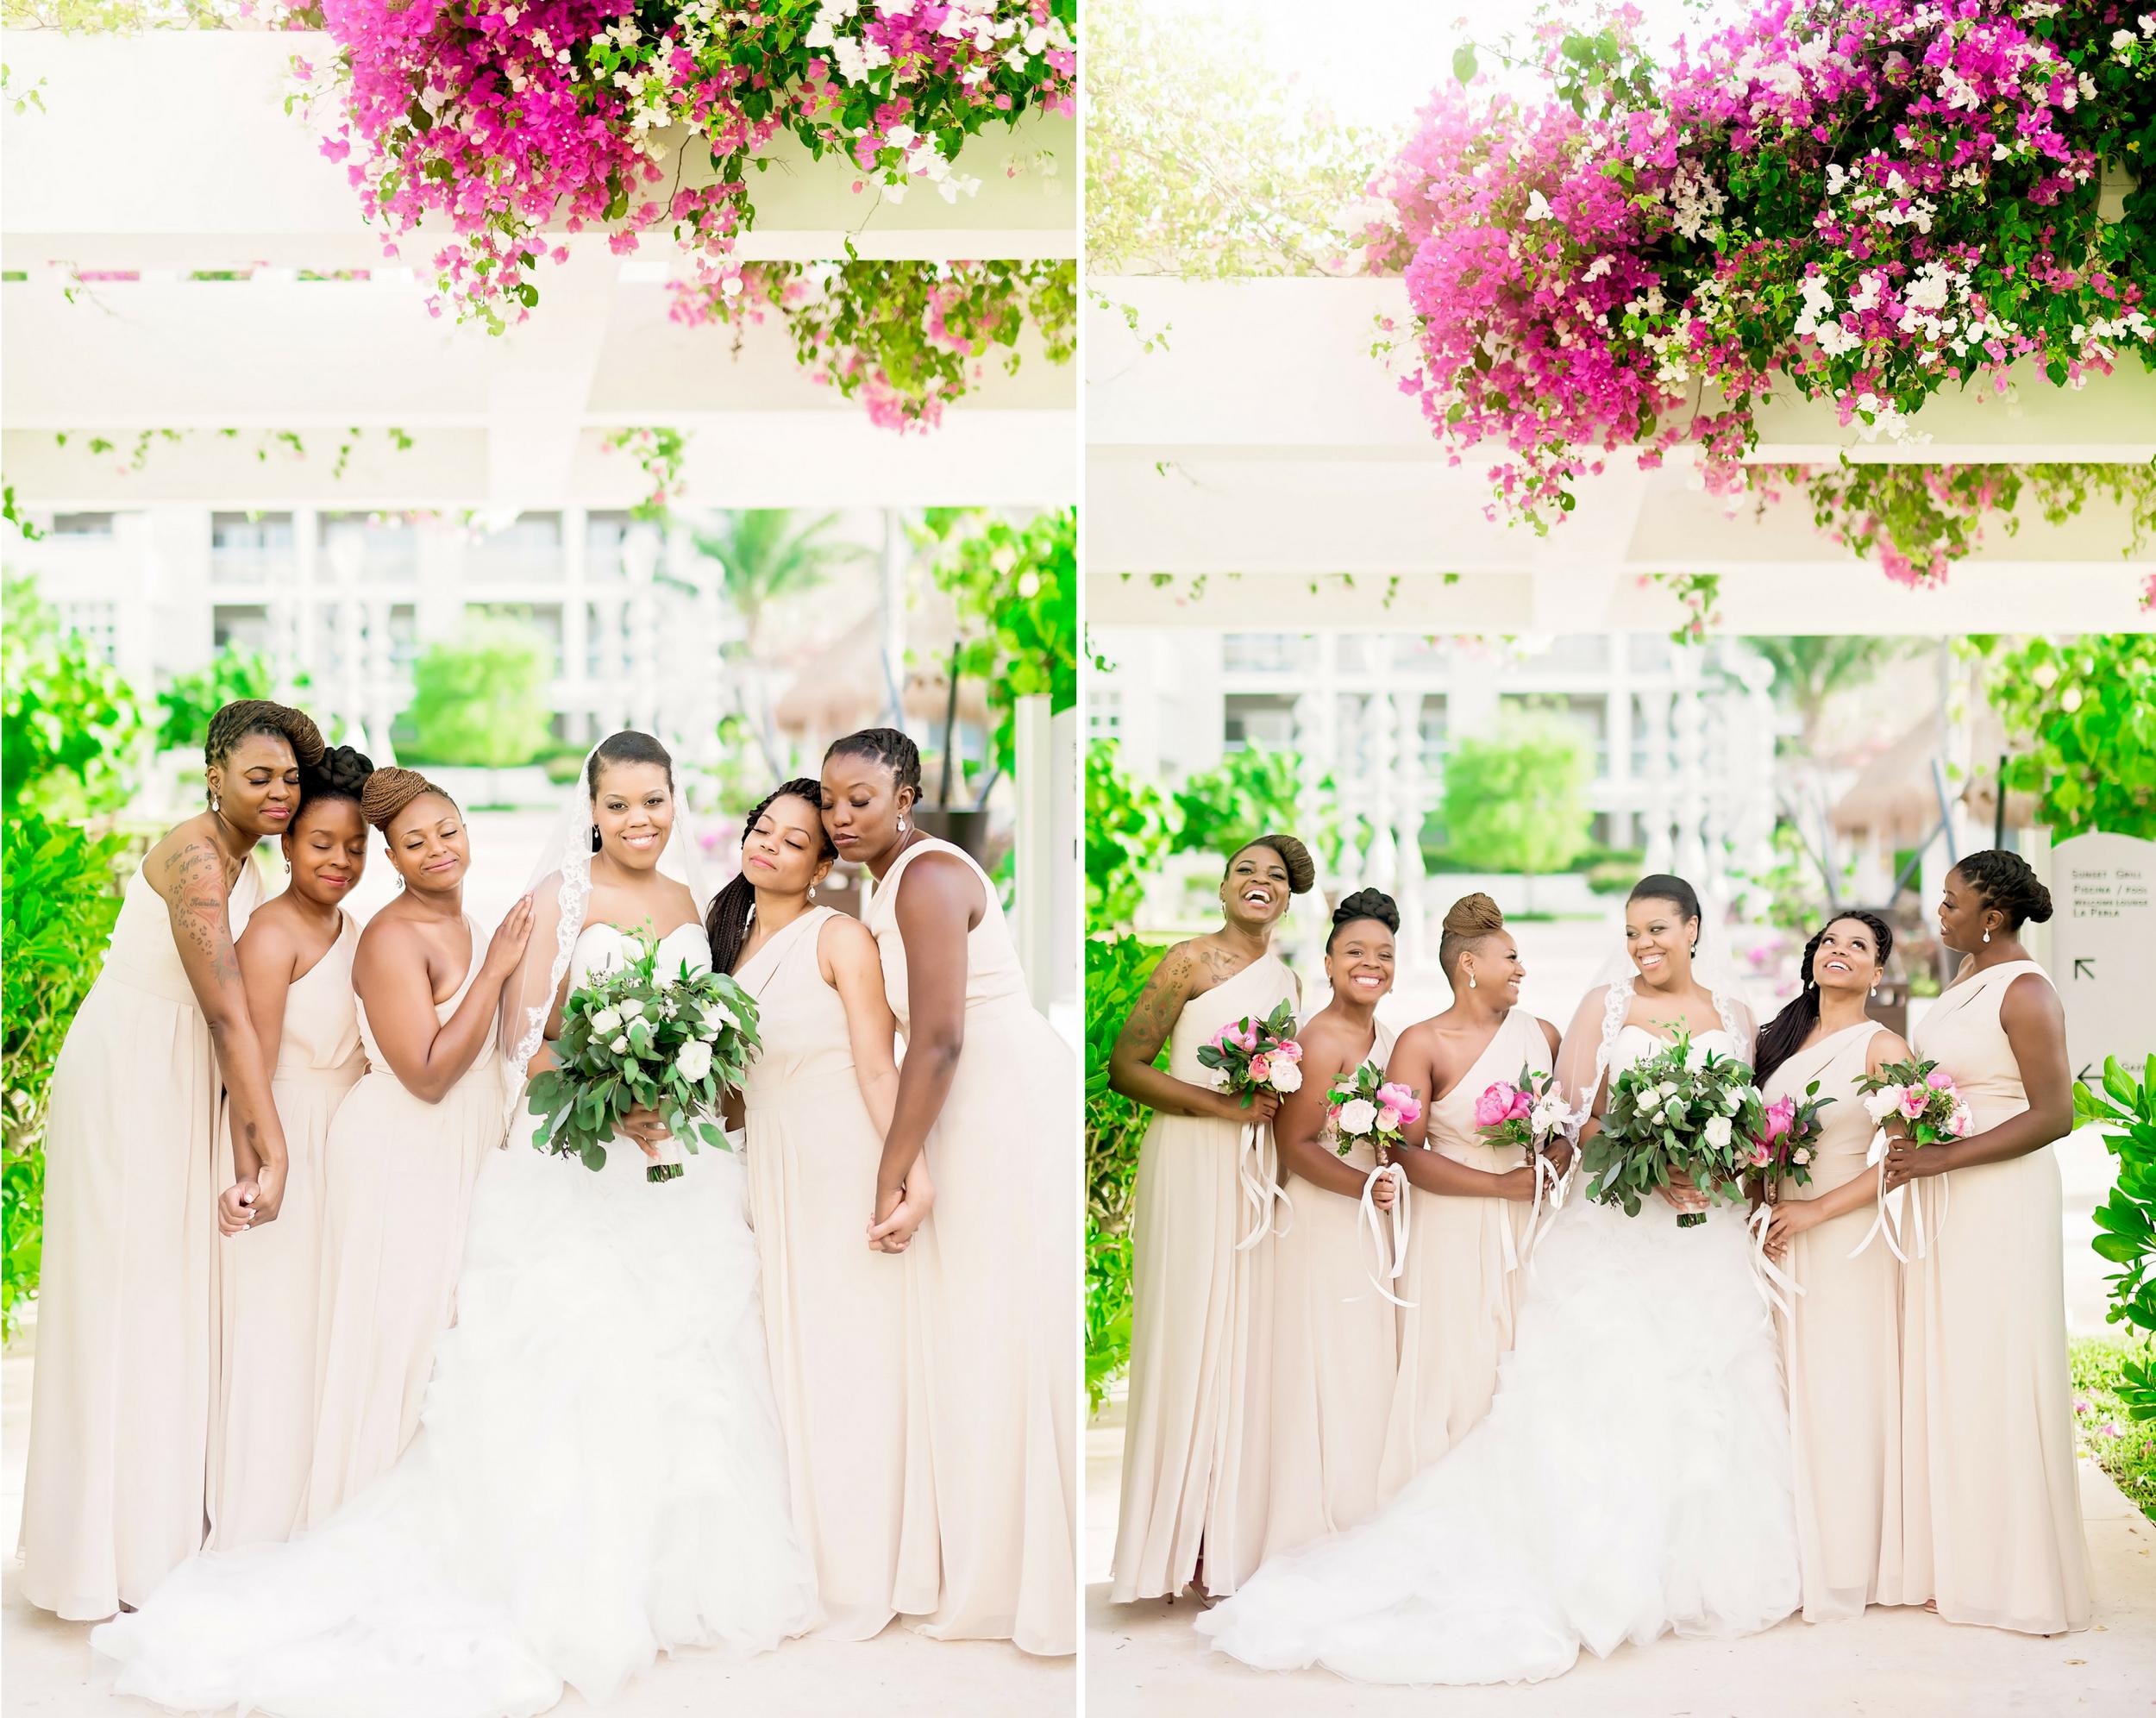 Mexico Wedding- Pharris Photography- Destination Wedding- Lauren and Curtis- Bridesmaids